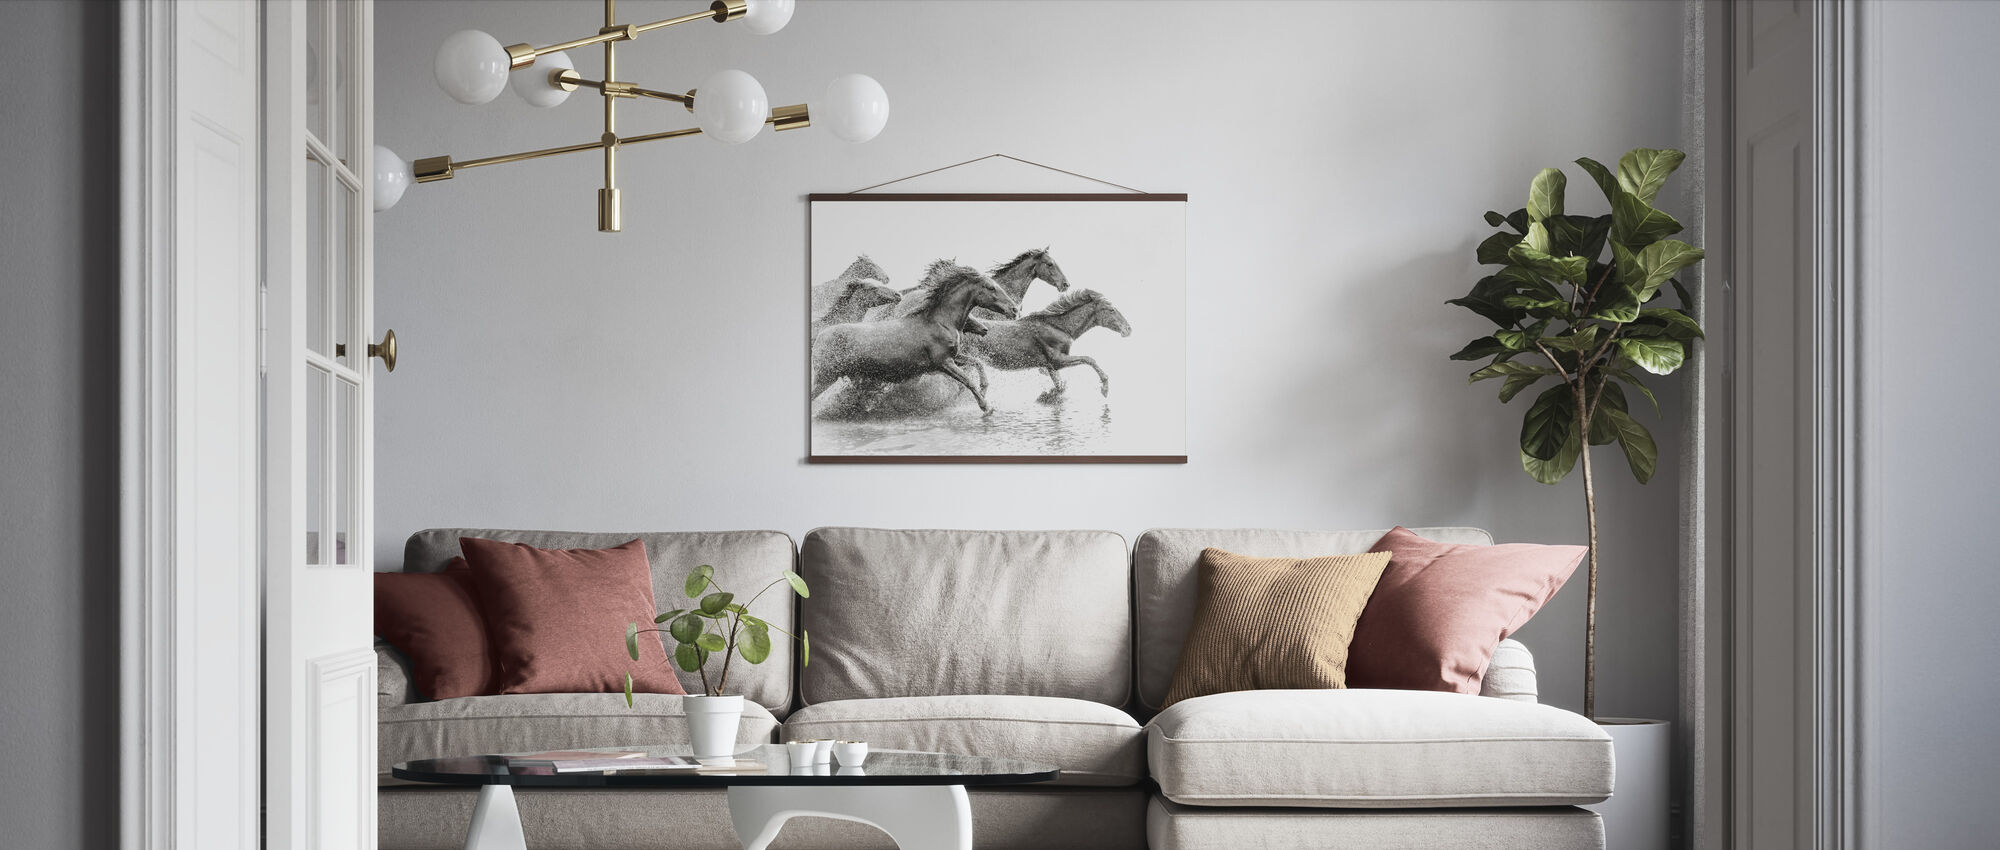 Herd of Wild Horses - Poster - Living Room